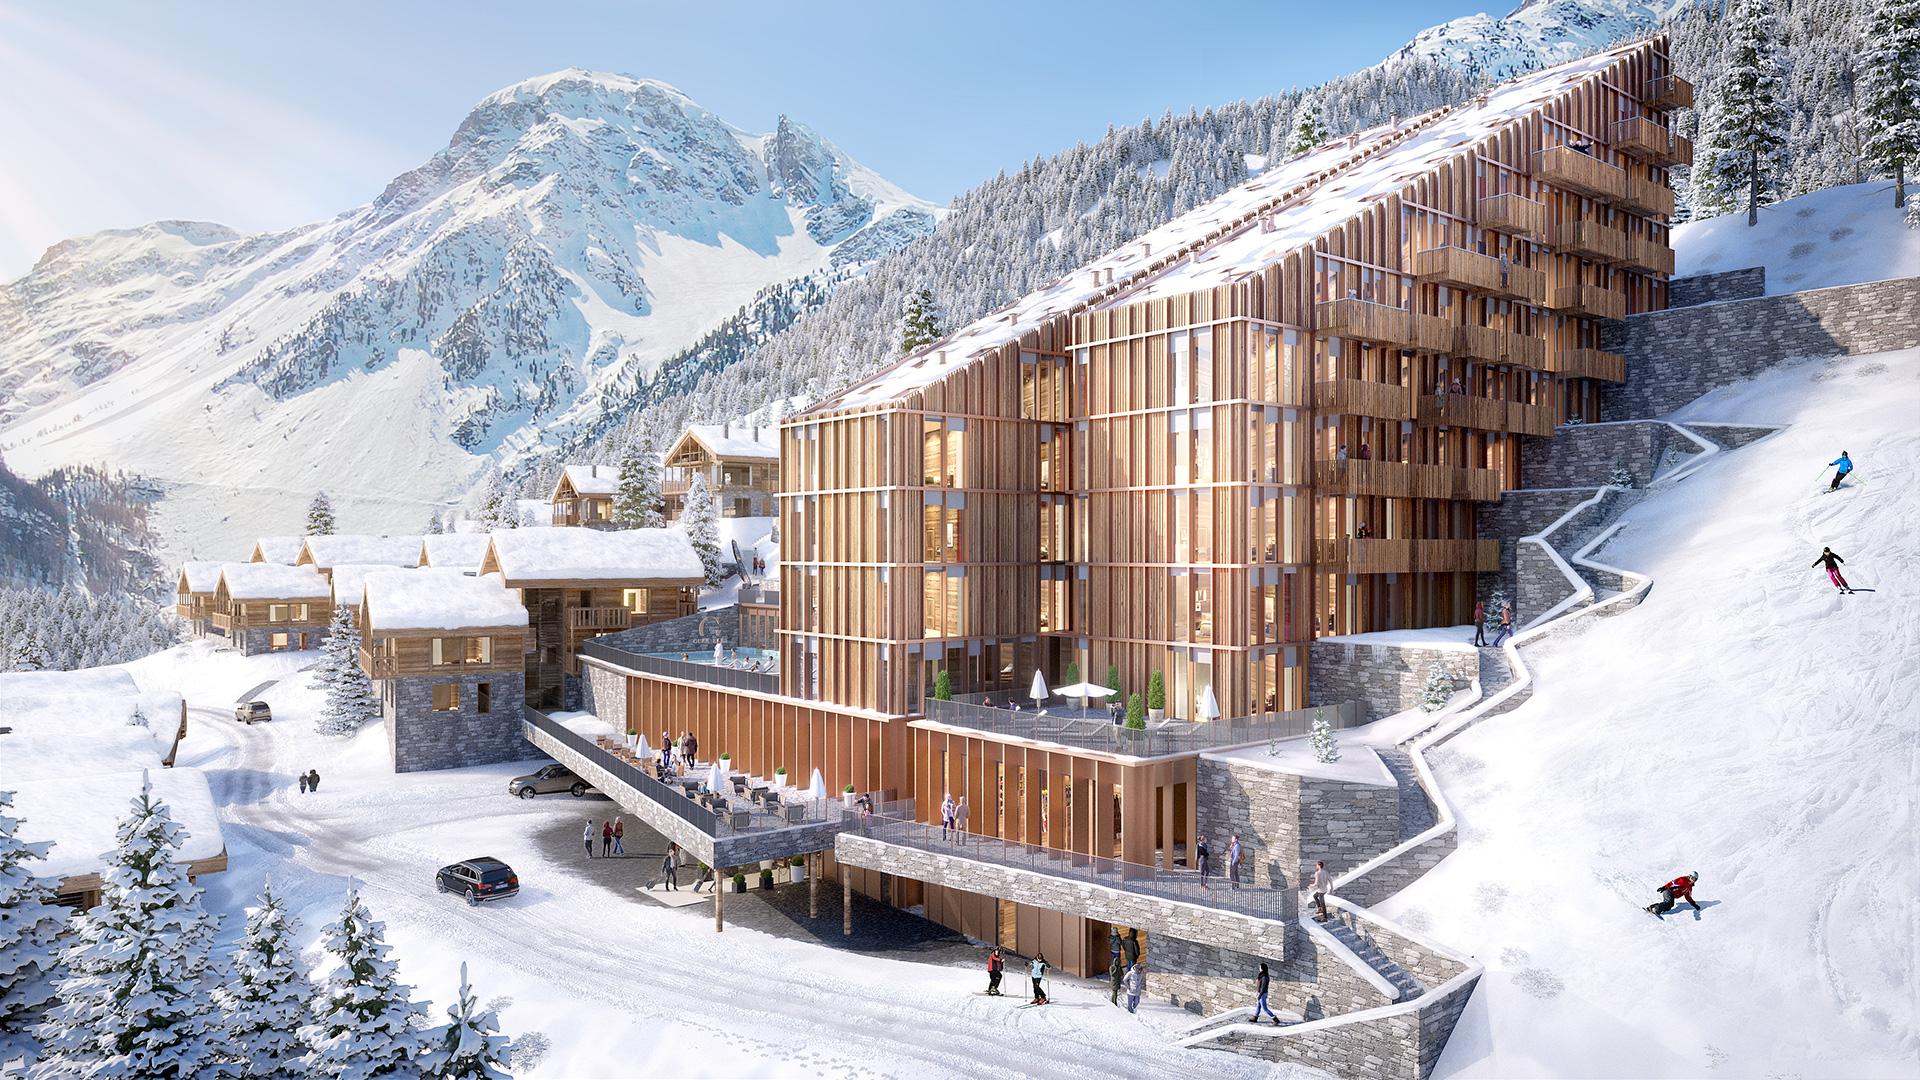 Guerneres Lodges Apartments, Switzerland